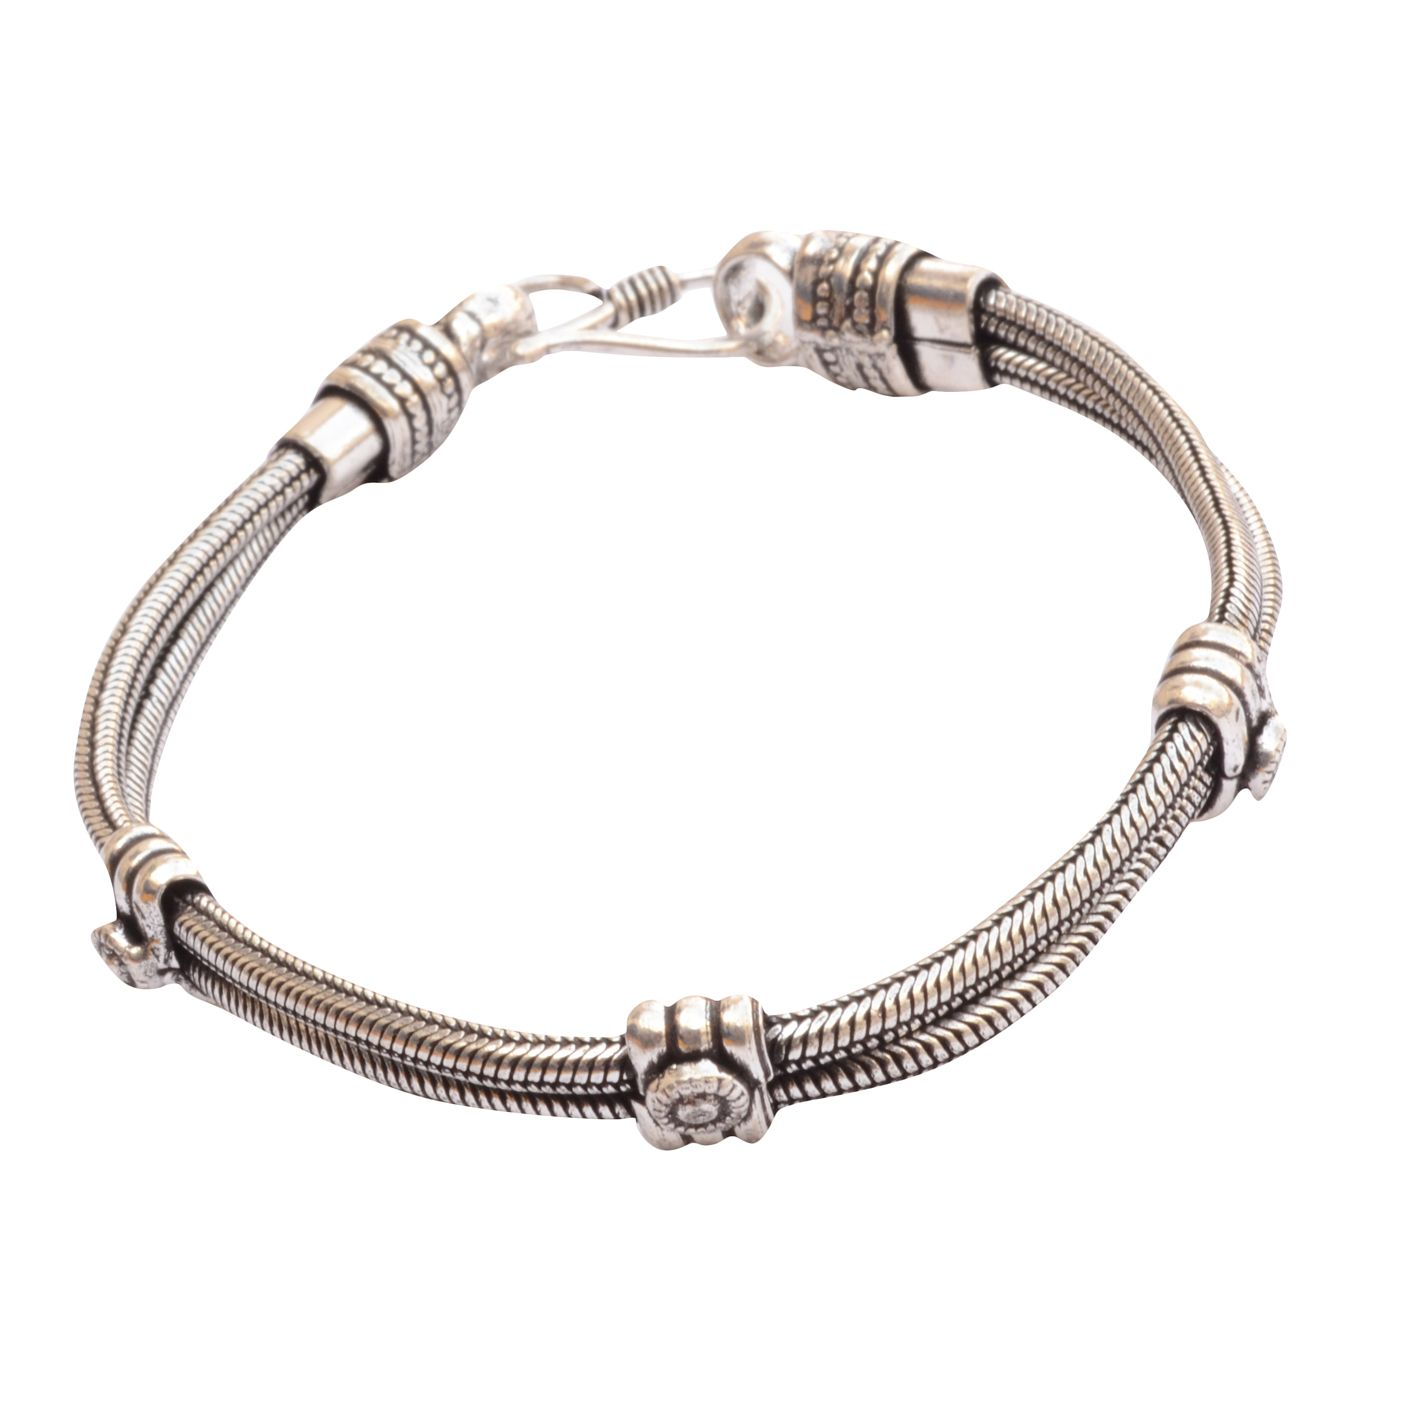 Classy german silver bracelet wrist band for men menus jewellery